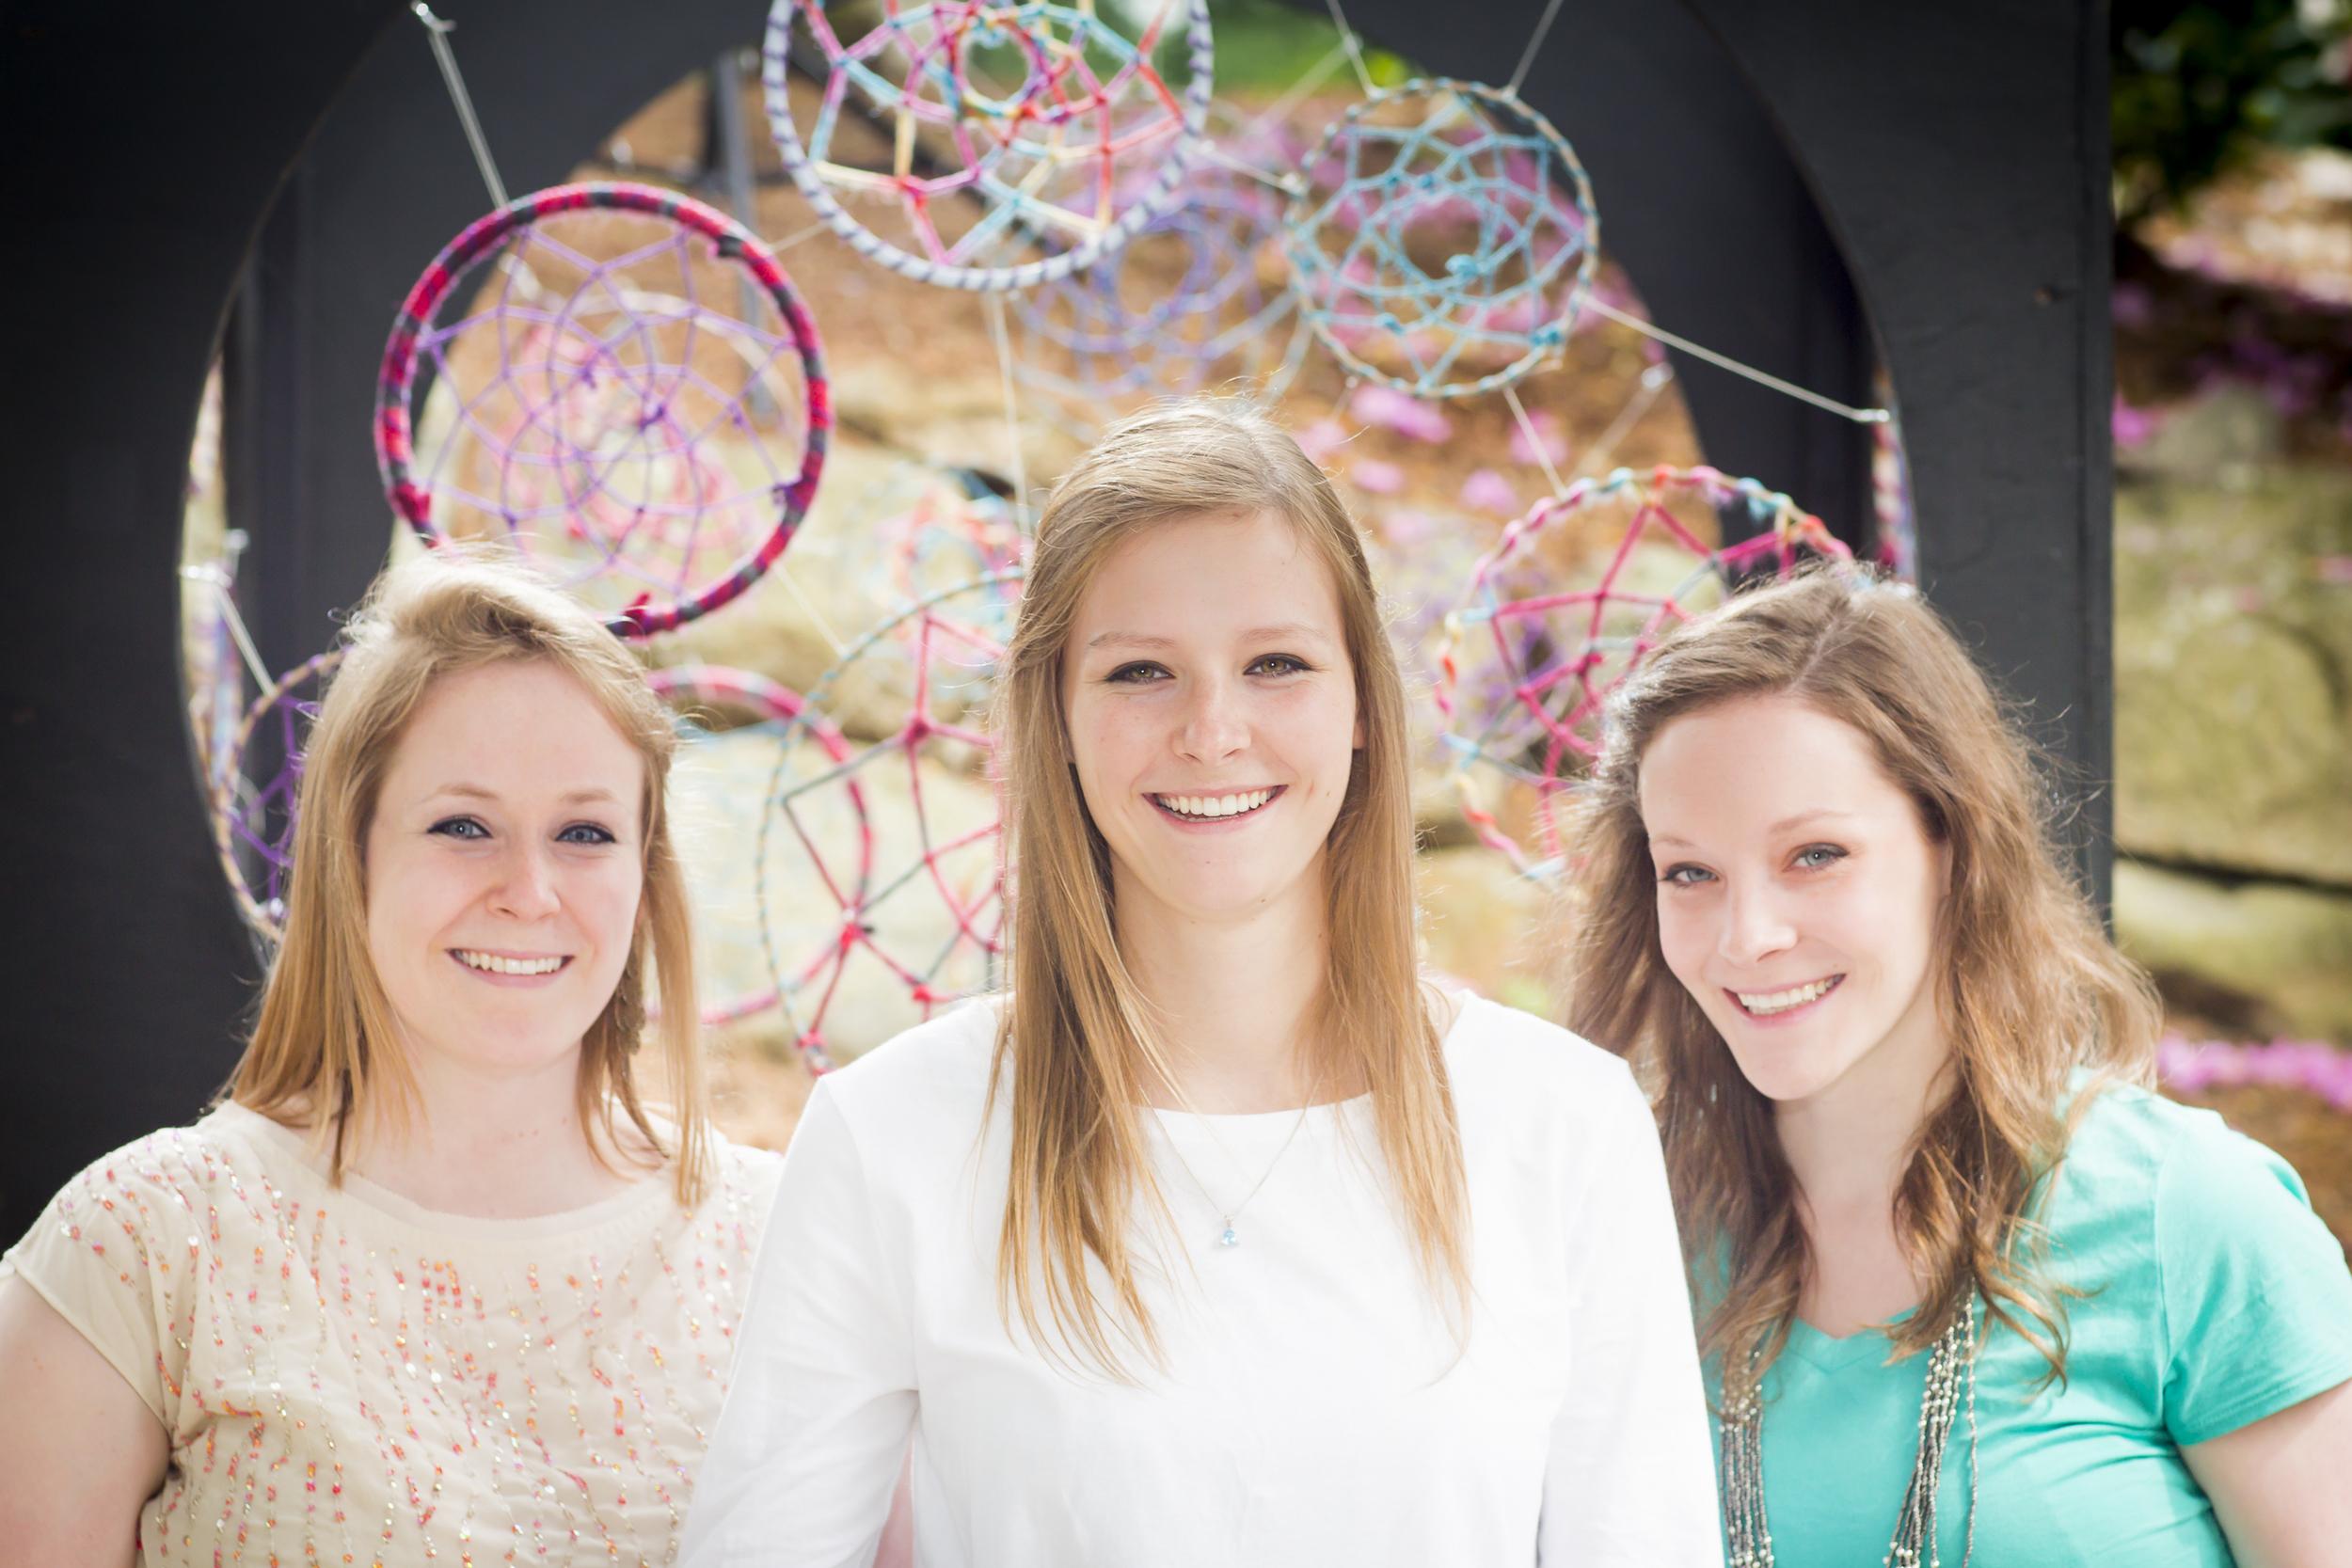 20 3 sisters family portrait outdoor session vibrant dream catchers.jpg